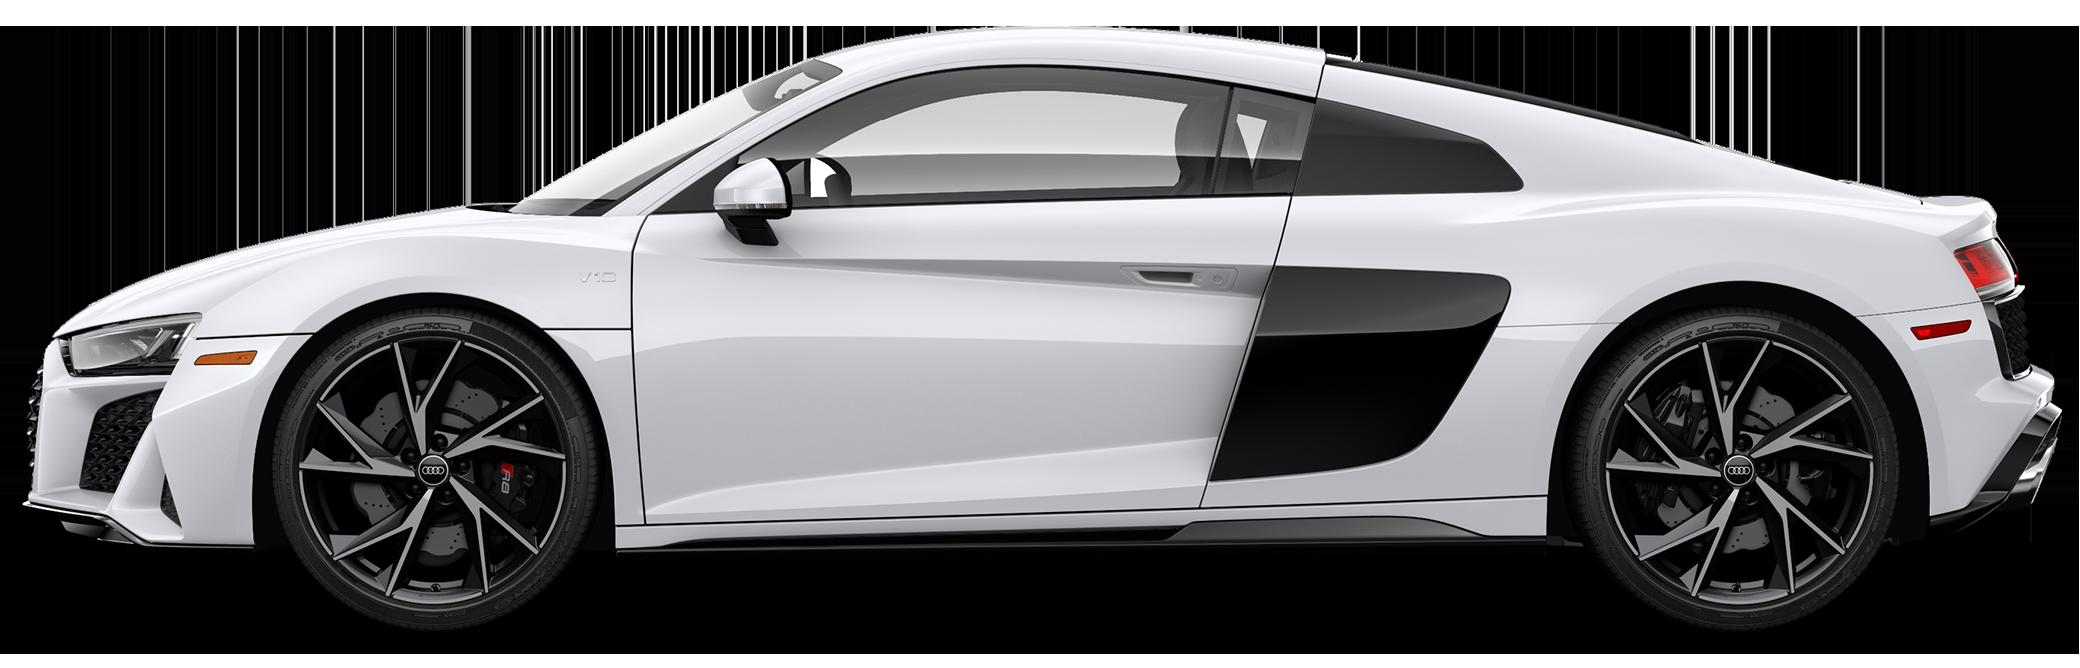 2022 Audi R8 Coupe 5.2 V10 performance